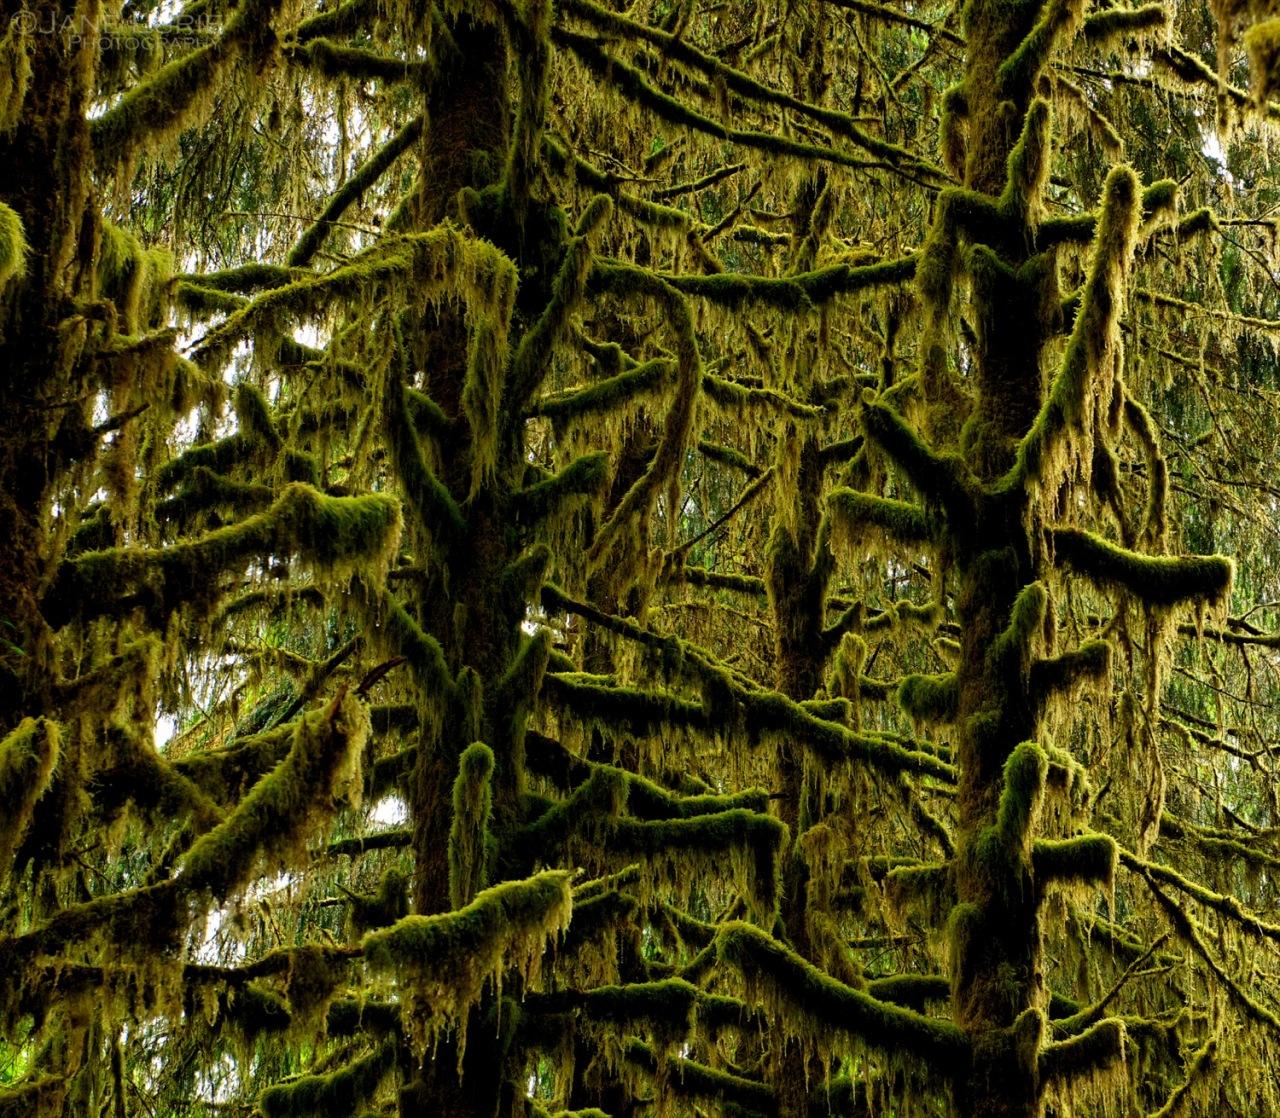 Hoh Rainforest, Olympic National Park,Washington